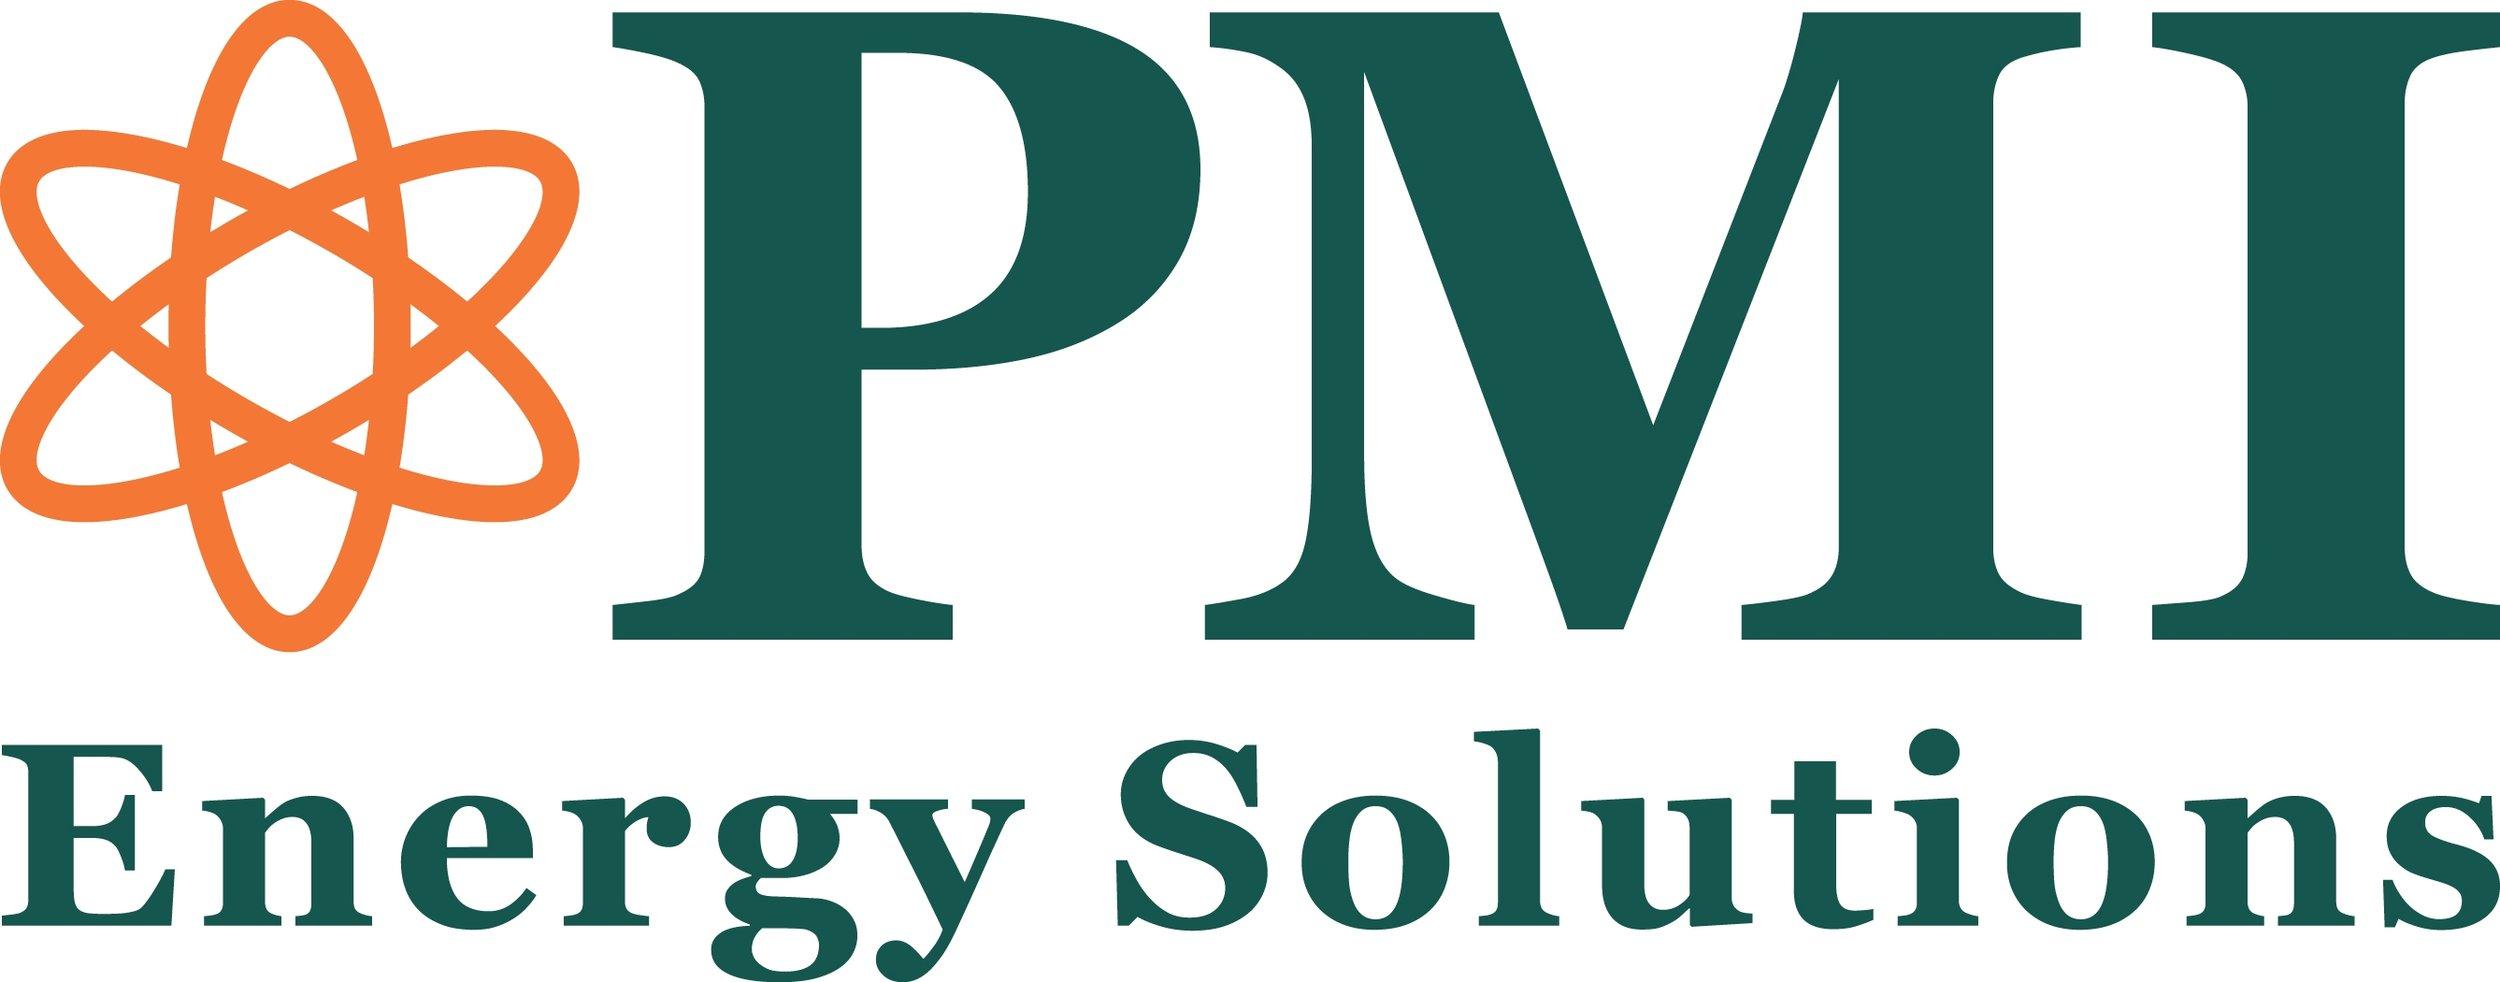 PMIES logo.JPG